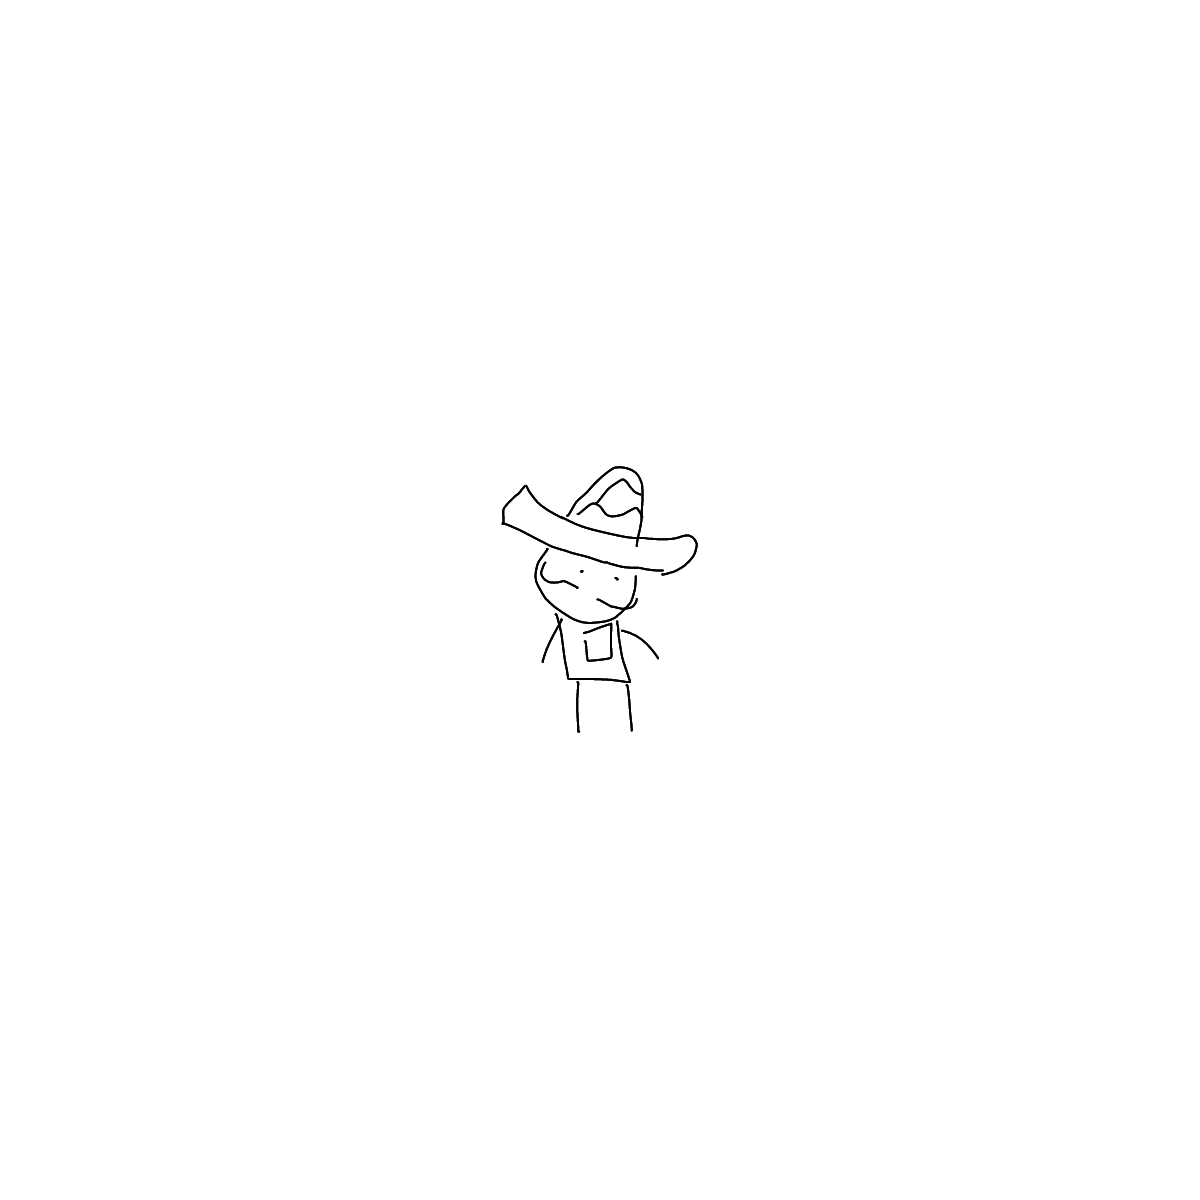 BAAAM drawing#5305 lat:33.5854988098144500lng: -101.8739700317382800